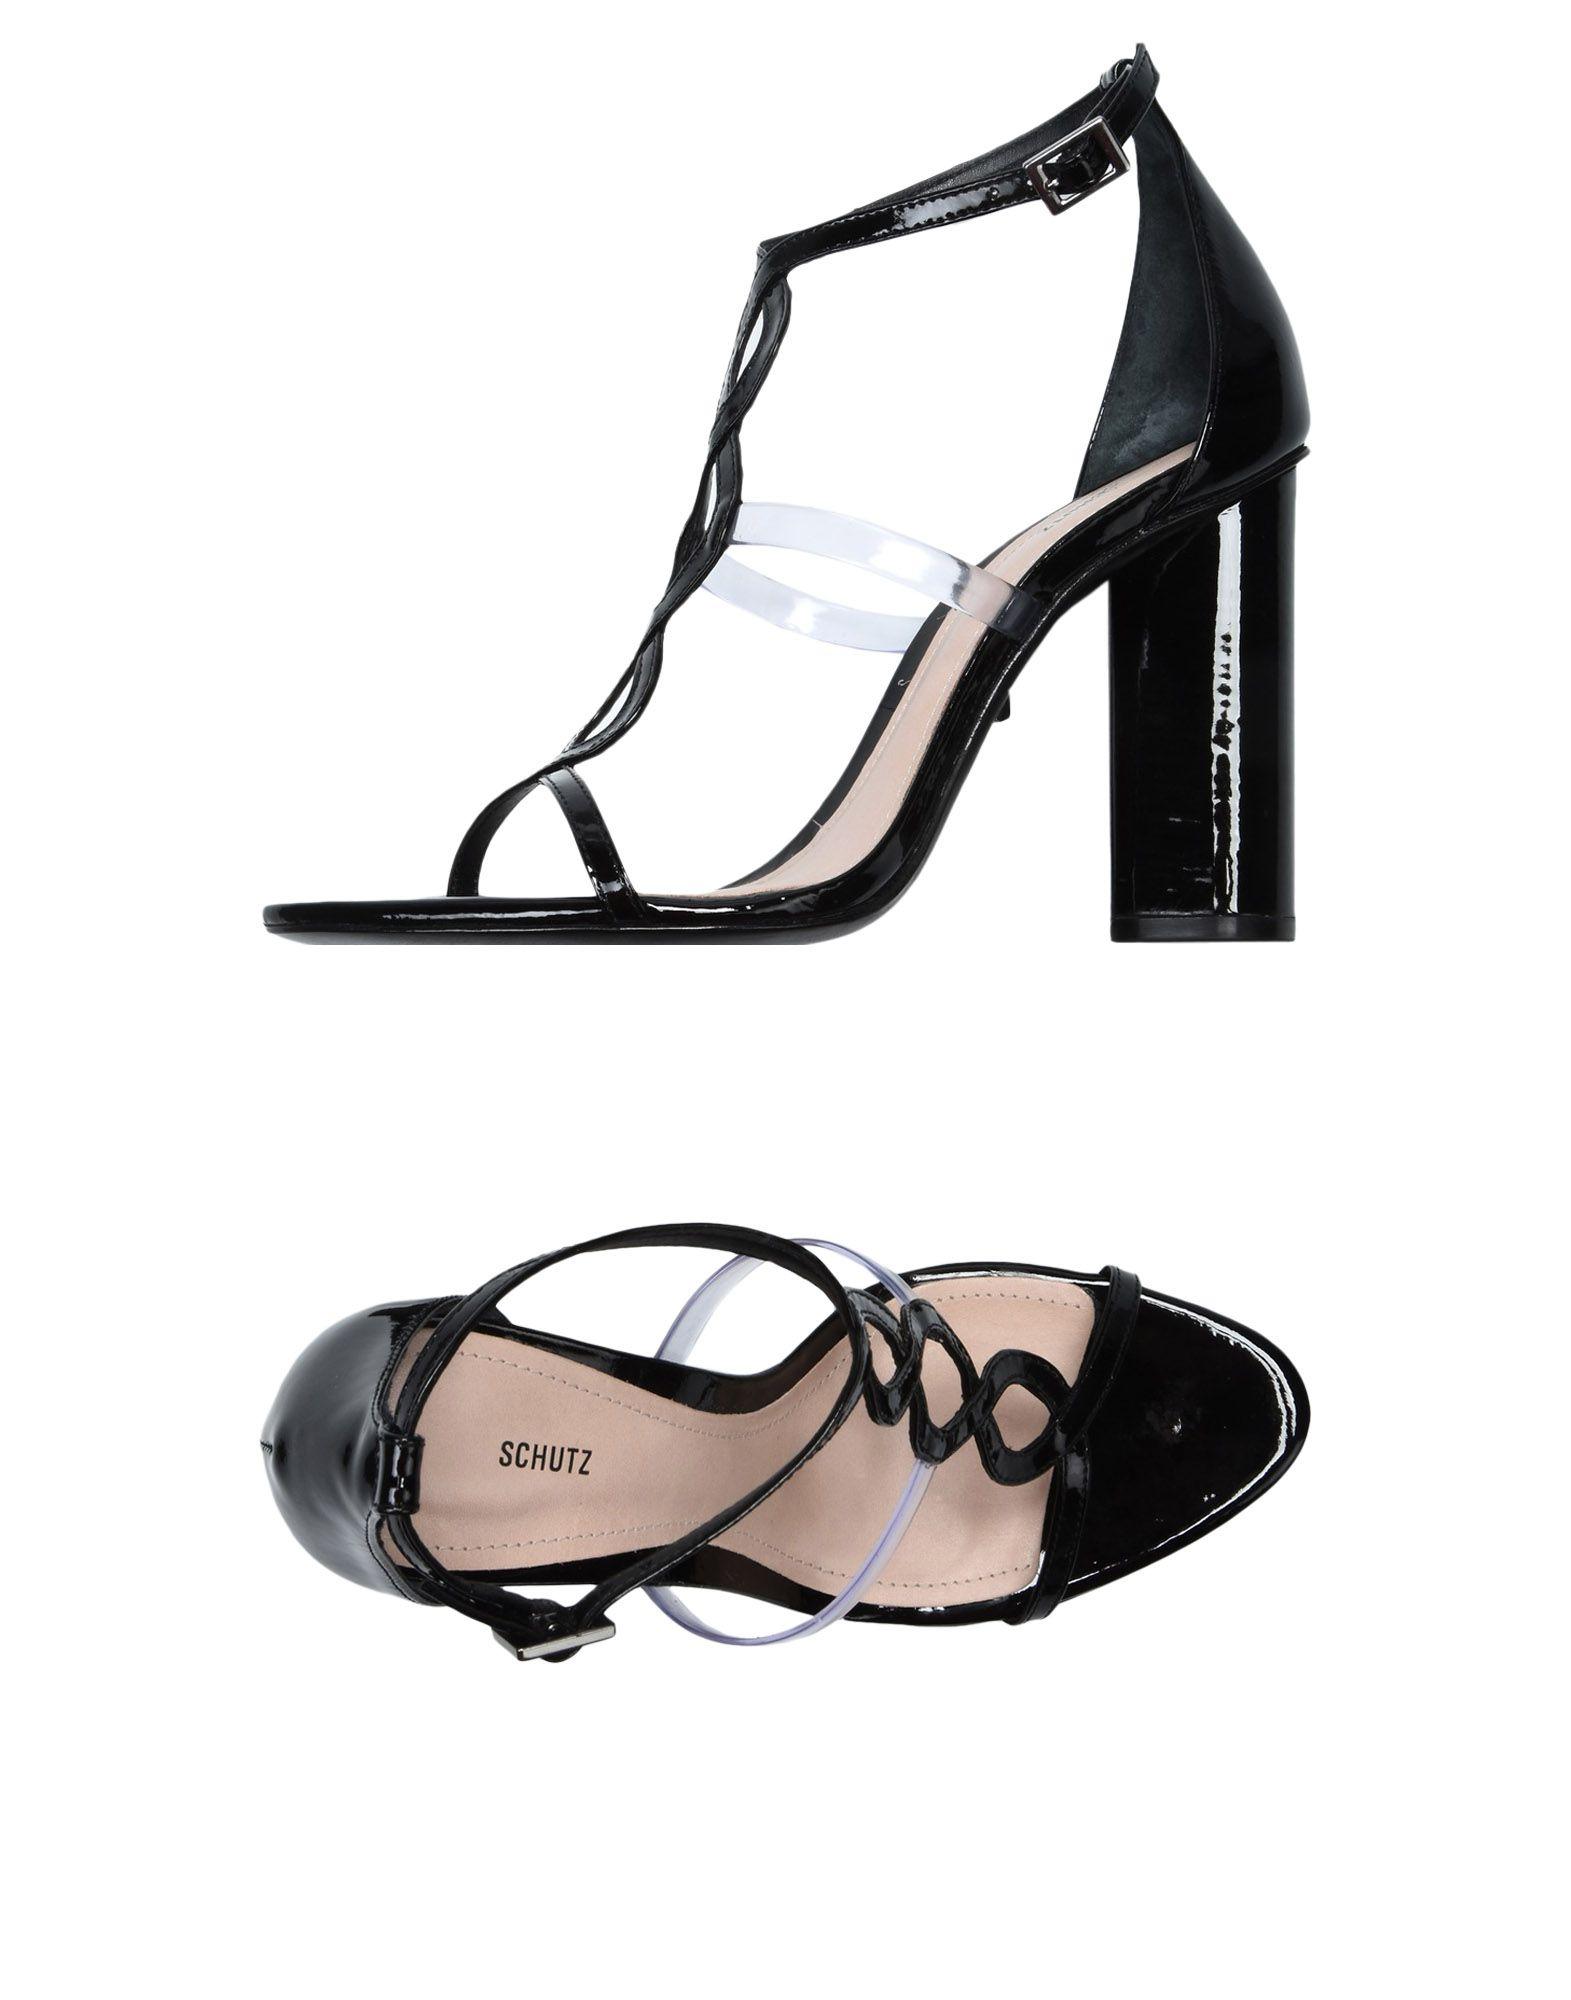 Moda Sandali Schutz Donna - 11483077AW 11483077AW - a2b3ec